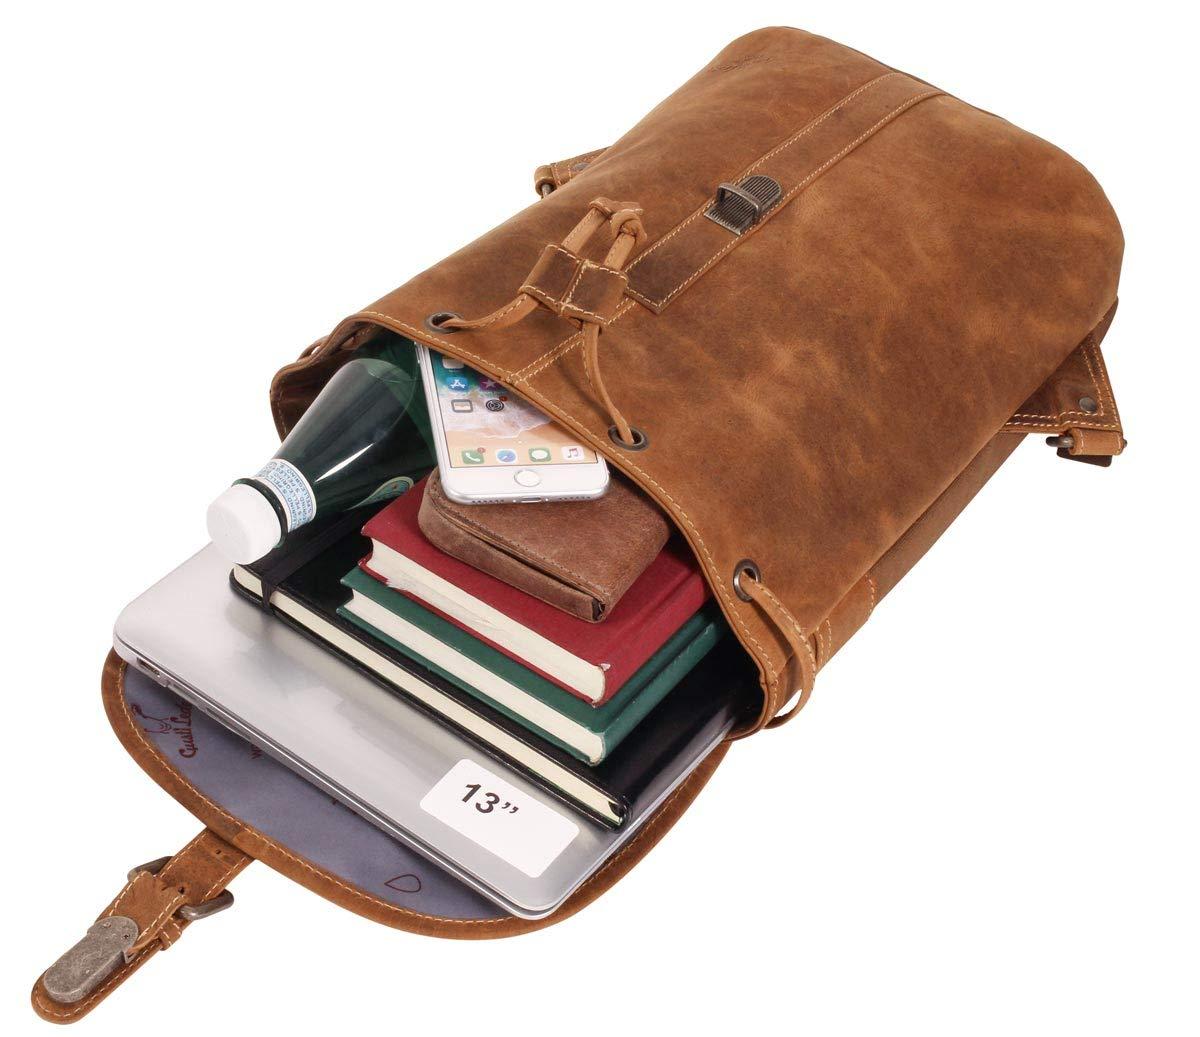 Gusti-Leder-Rucksack-Braun-Laptop-Lederrucksack-Business-Cityrucksack-Stylisch